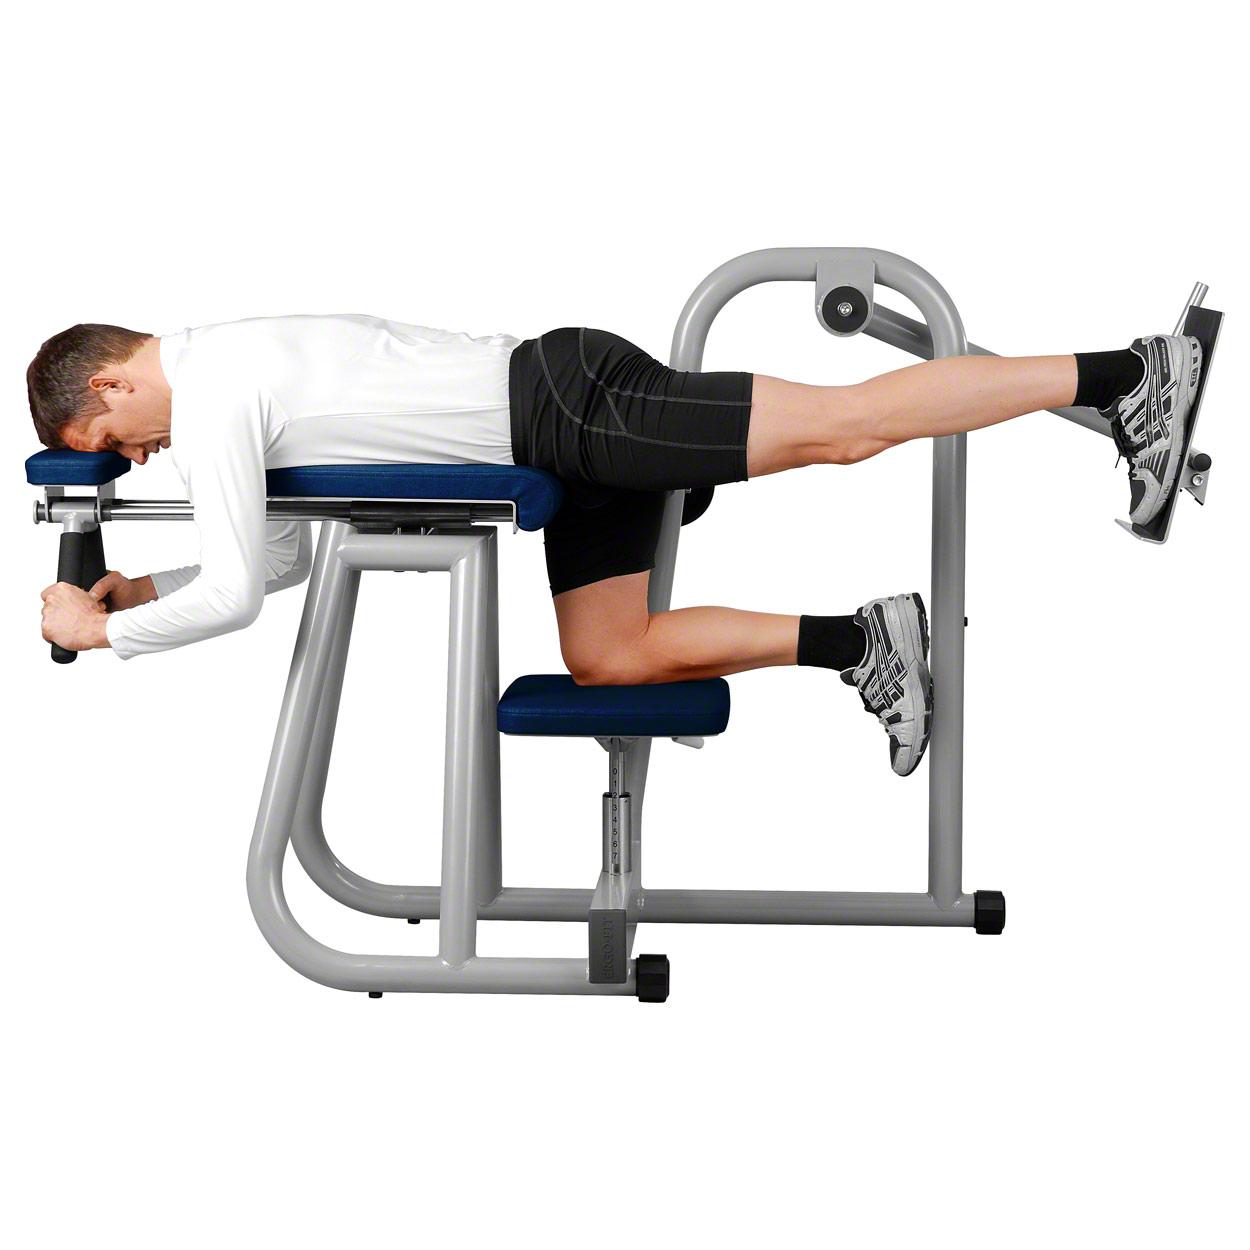 ERGO-FIT Hip Bench, Professionelles Fitnessstudiogerät, Bauch Beine Po Trainer Trainer Trainer 13a24d